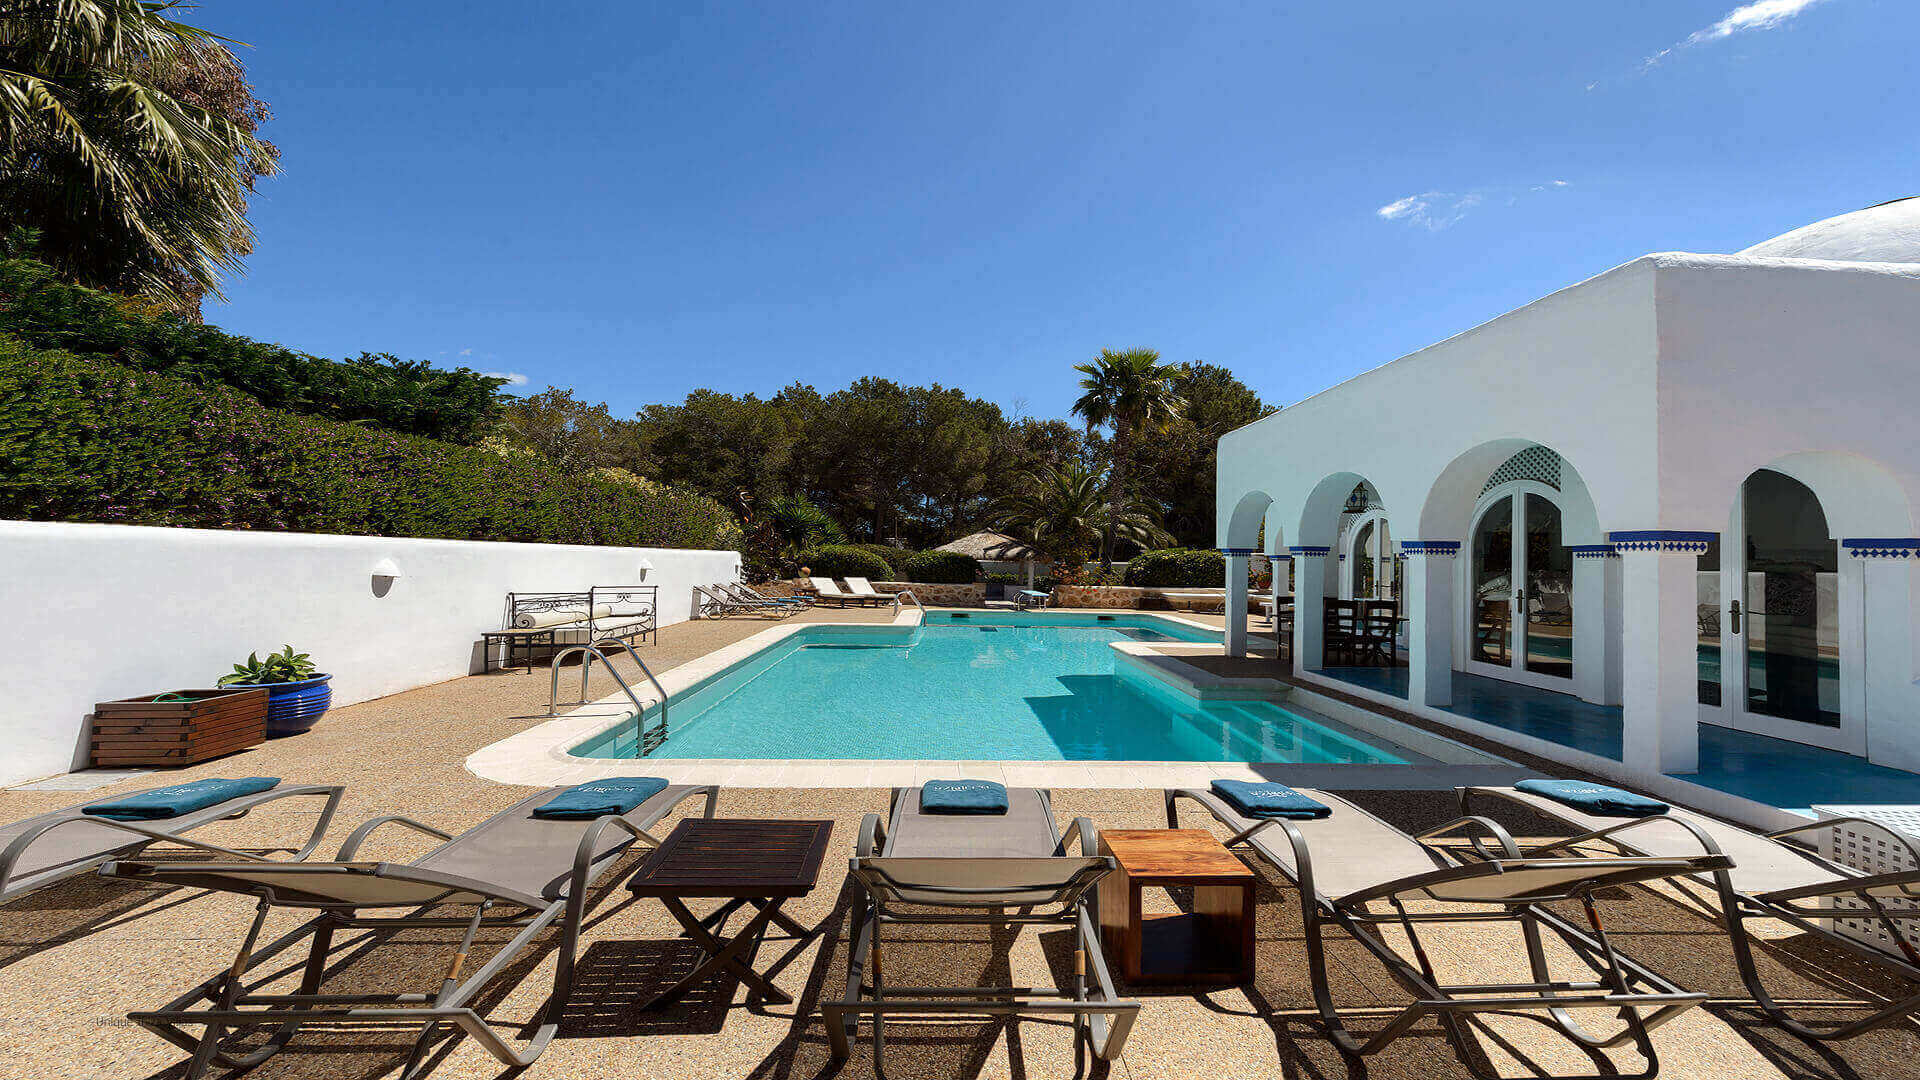 Villa Cigala Ibiza 6 Santa Eulalia